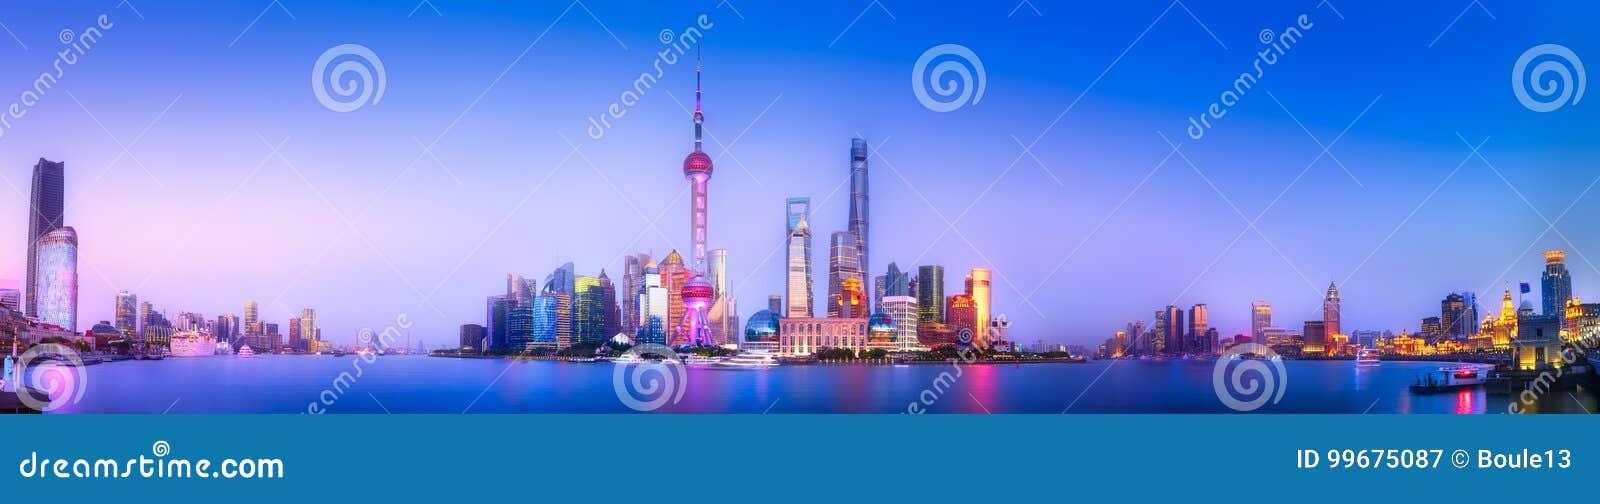 Download Shanghai skyline cityscape stock image. Image of futuristic - 99675087